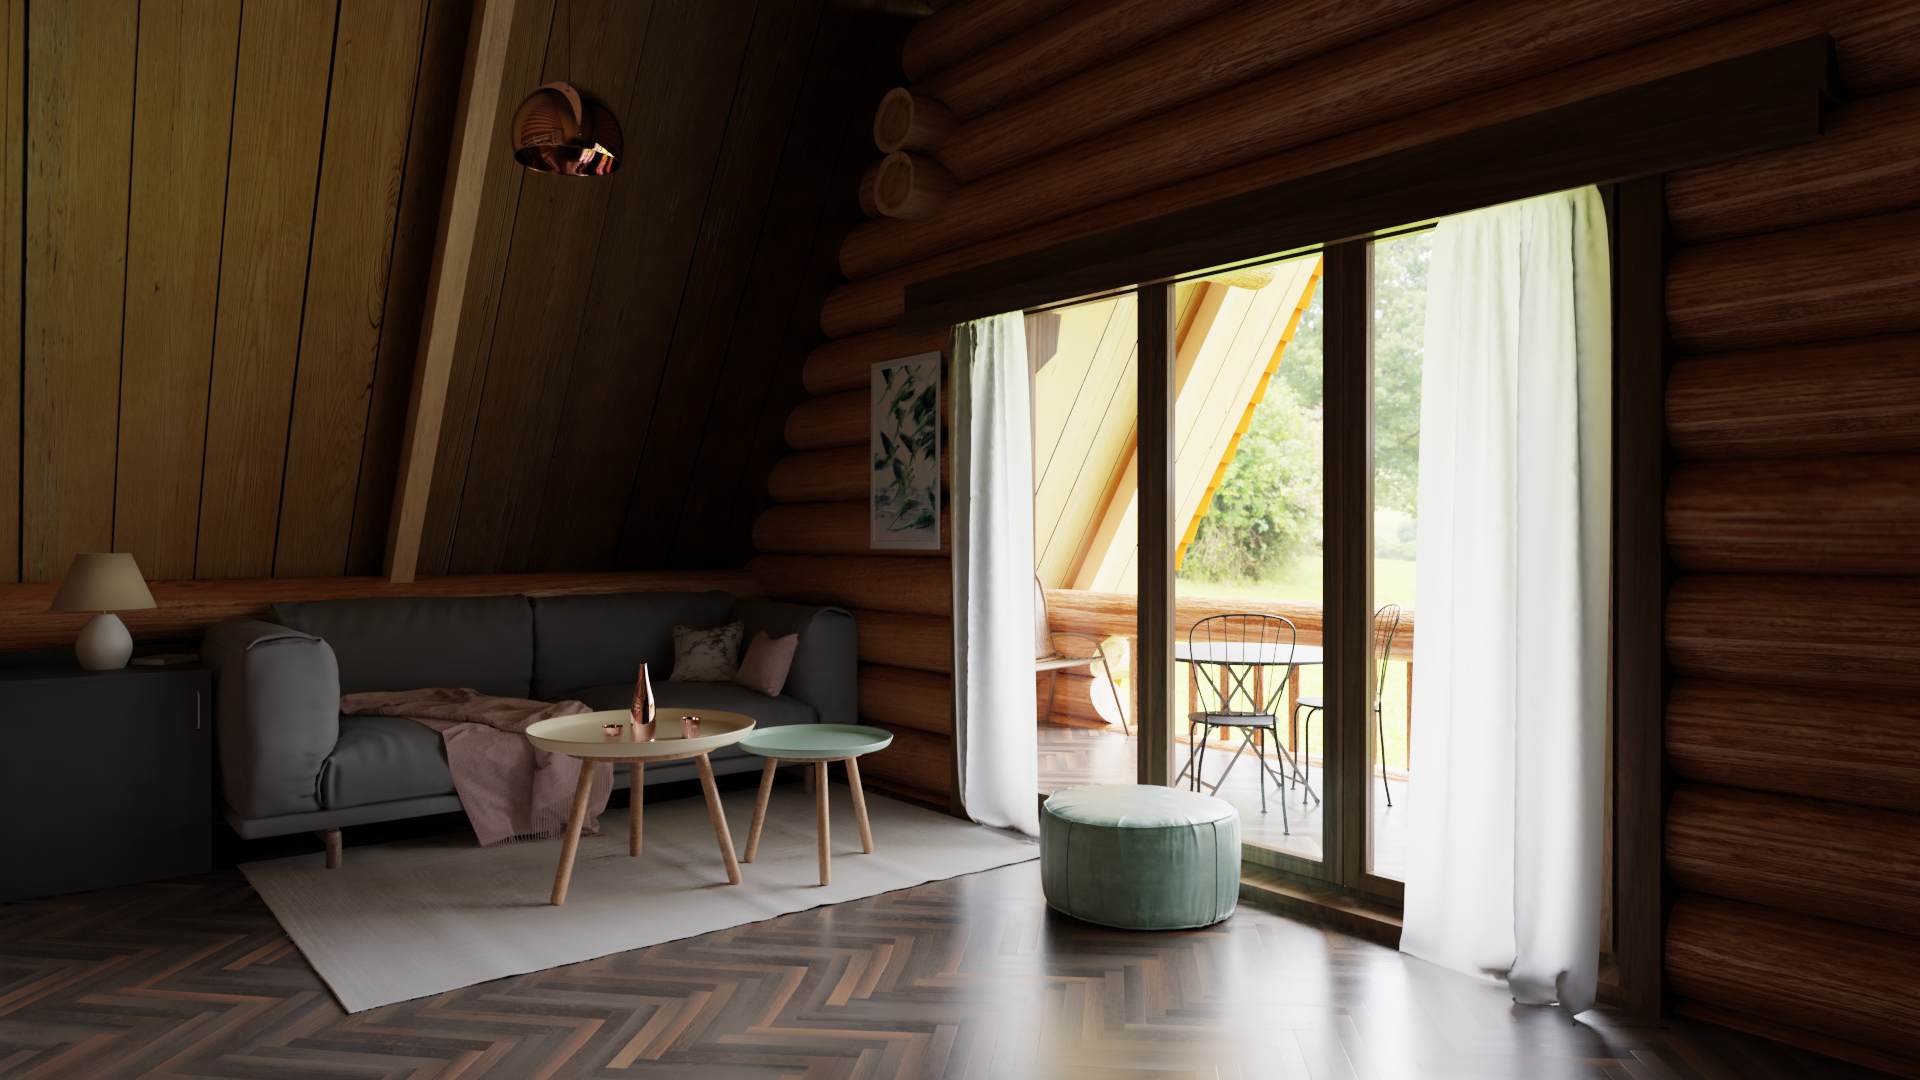 Wooden House in Blender cycles render image